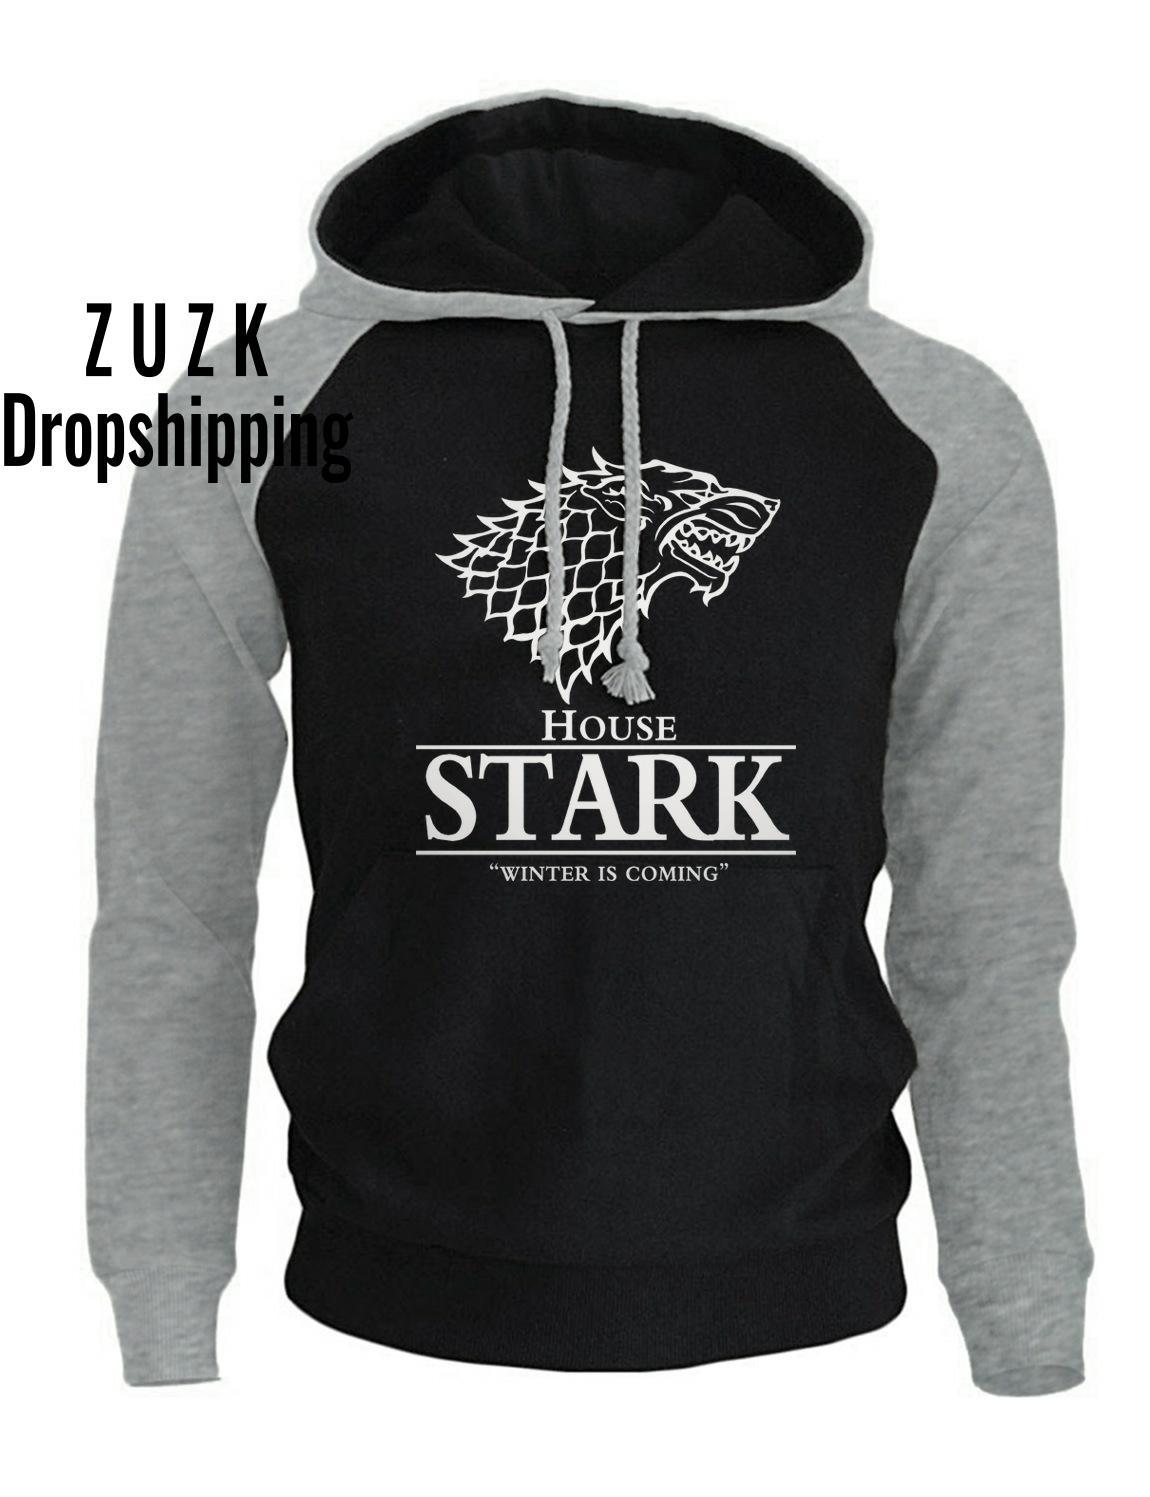 Raglan Hoodies For Men House Stark The Song Of Ice And Fire Winter Is Coming Men's Sportswear Game Of Thrones Sweatshirt